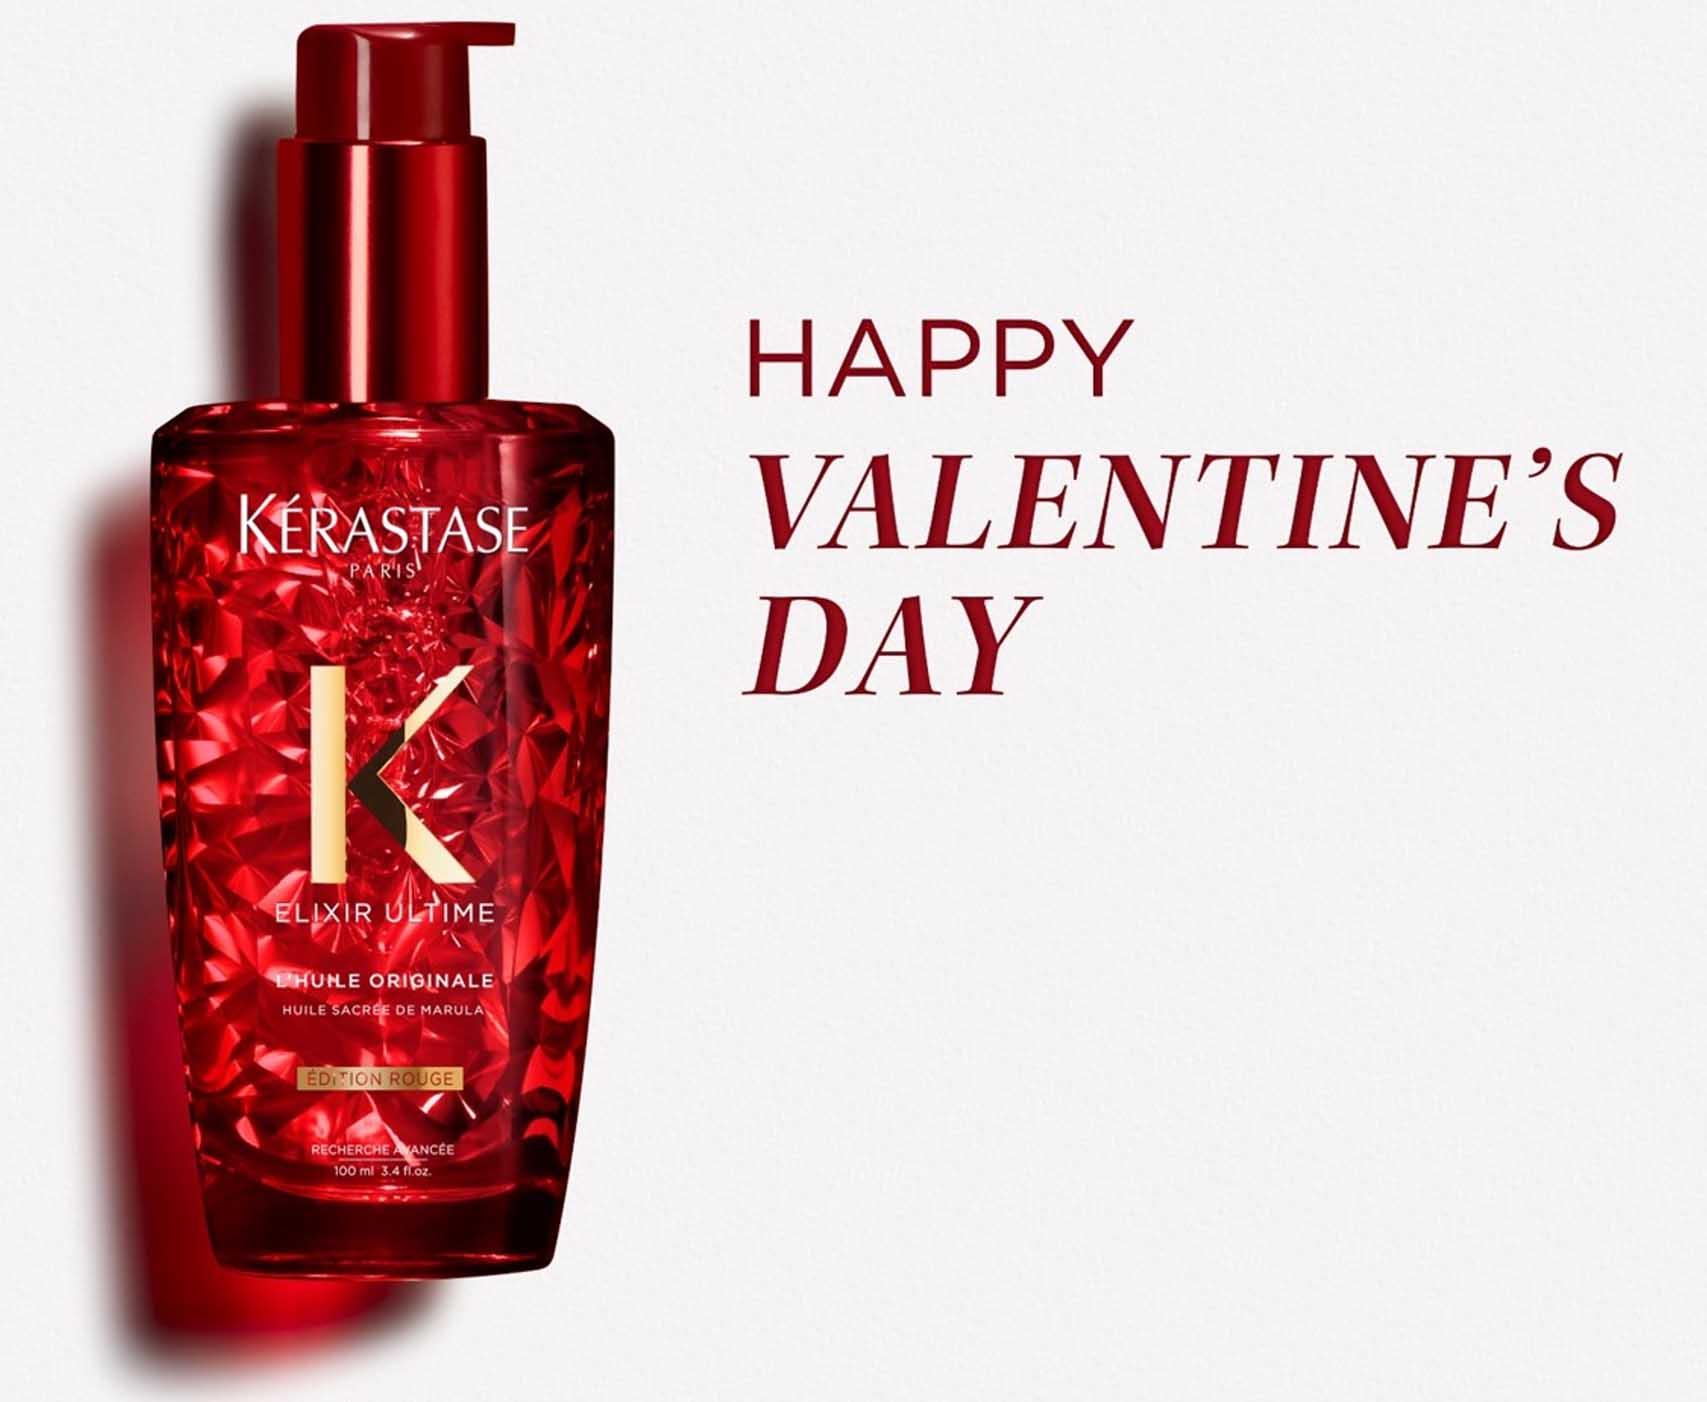 Valentine's Day 2020, קרסטס שמן לשיער אלקסיר אולטים באדום